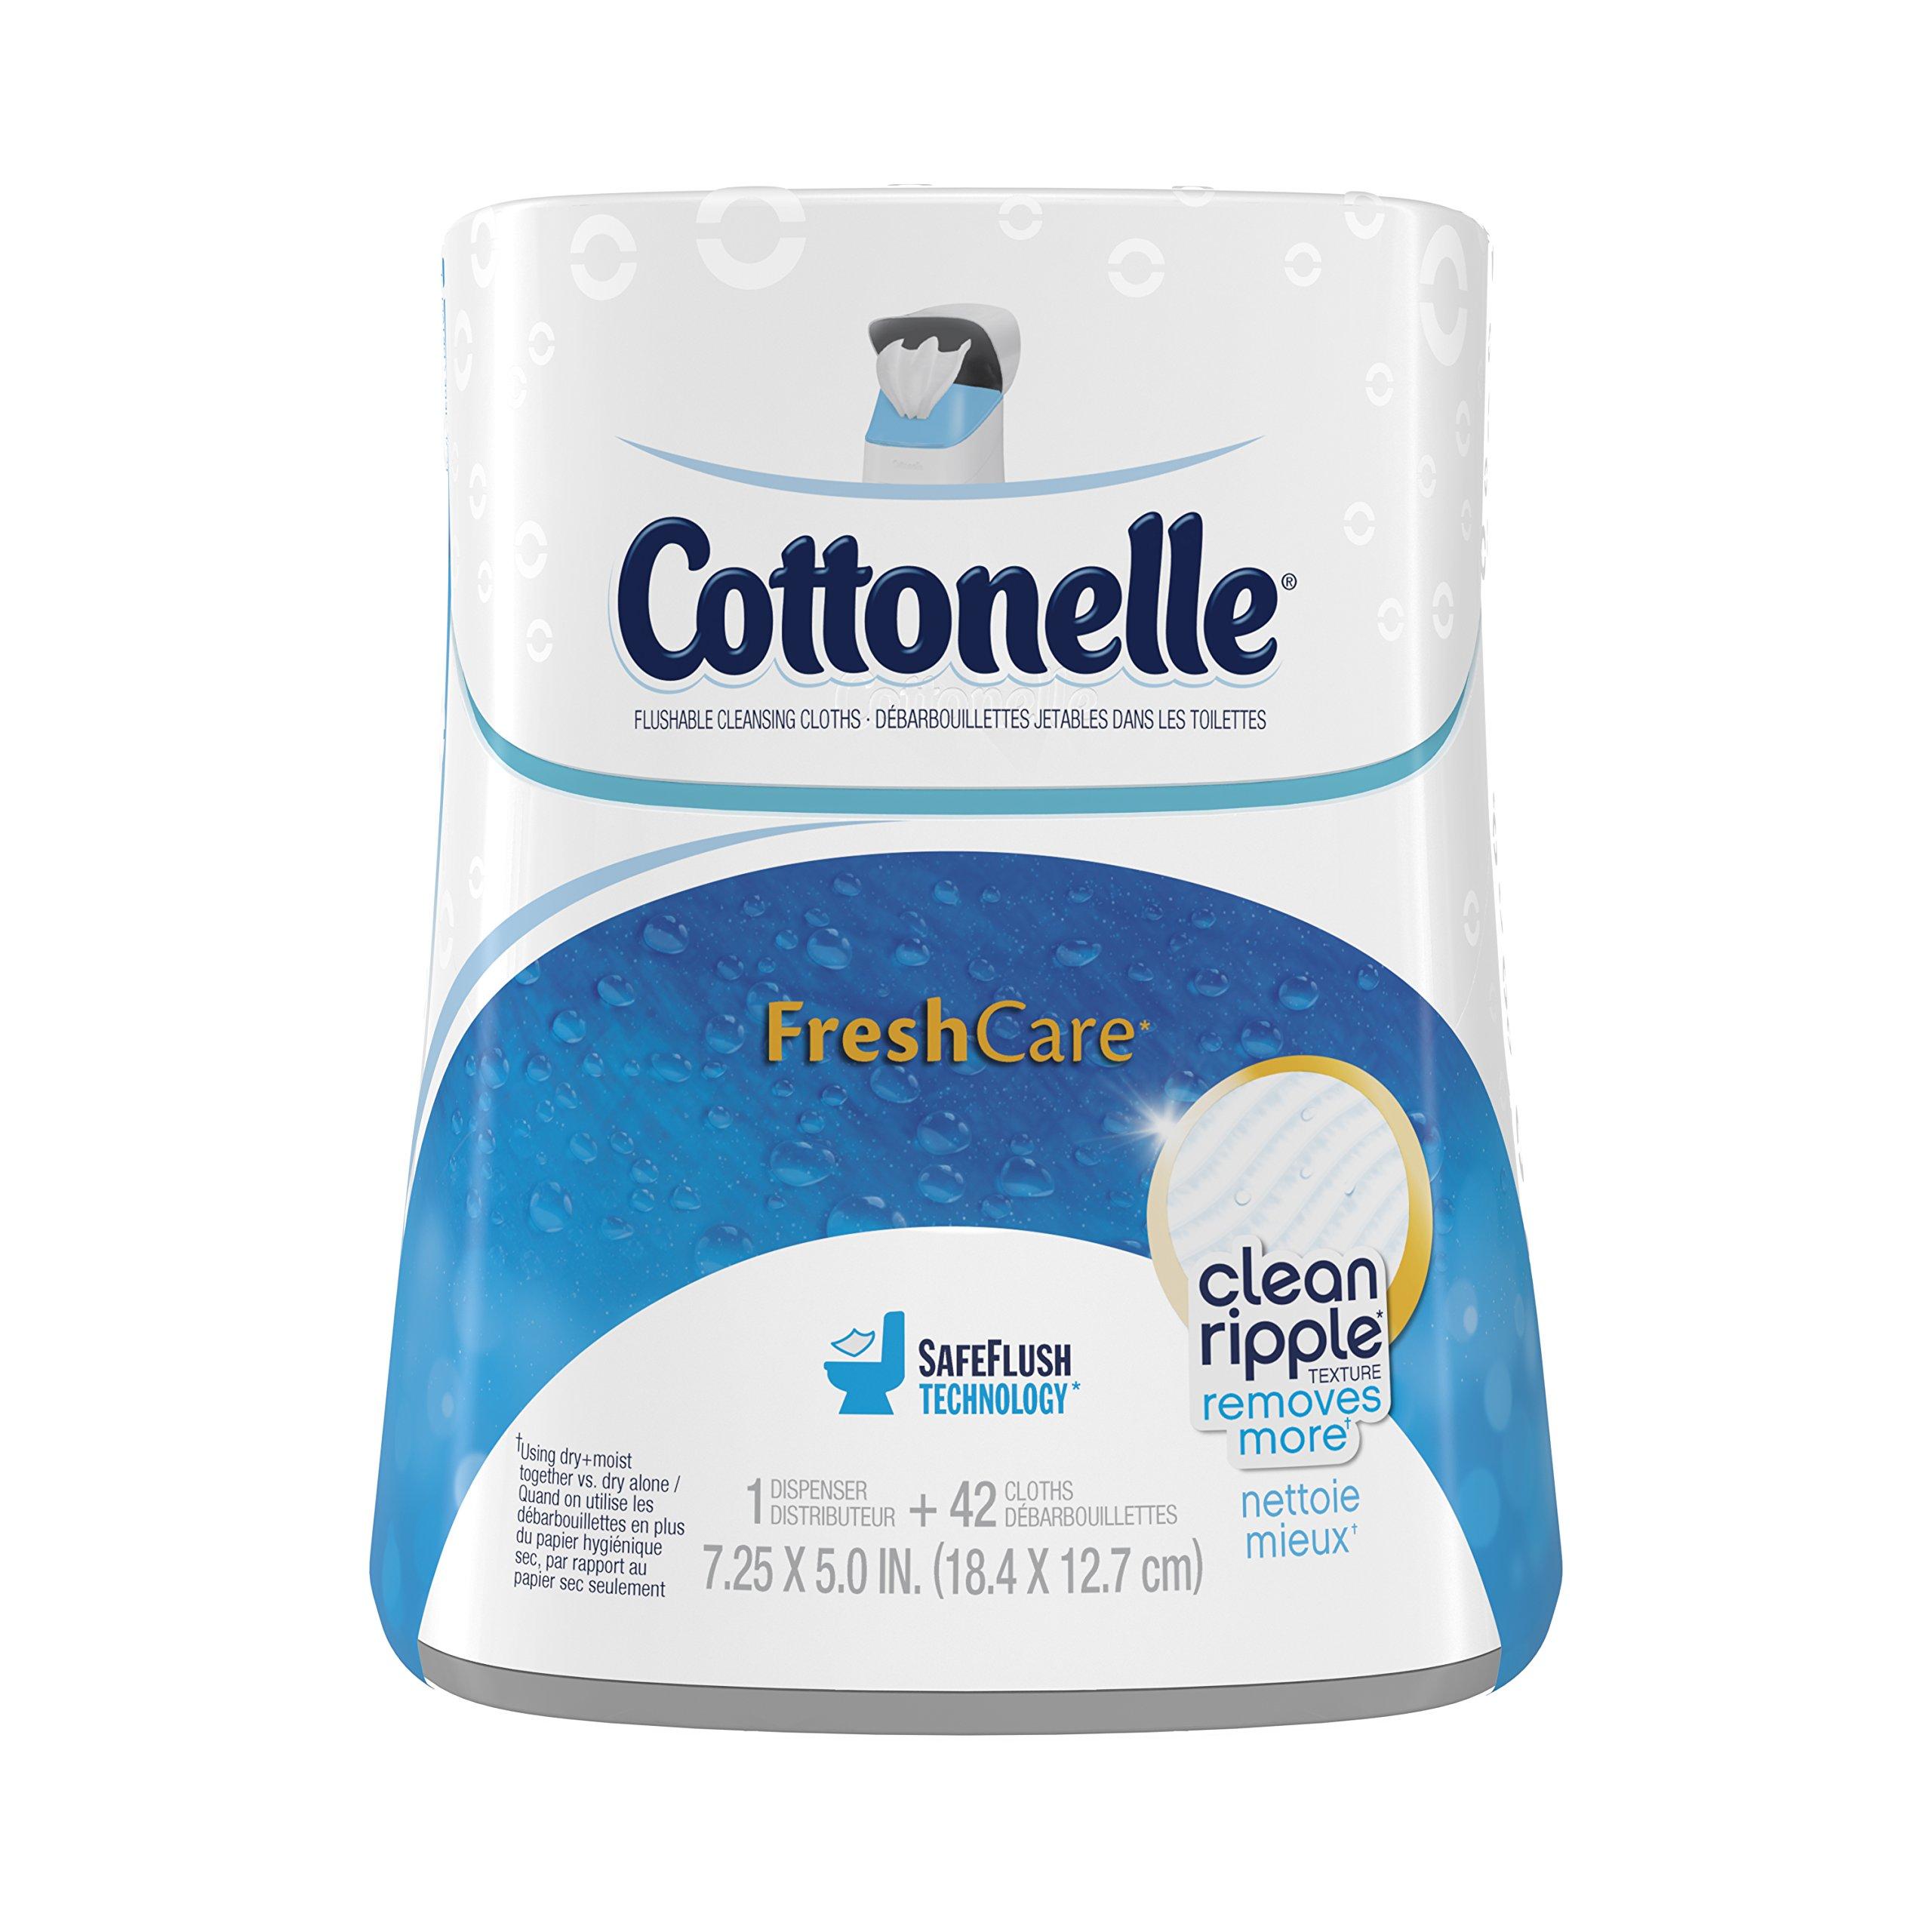 Cottonelle Fresh Care Flushable Cleansing Cloths Dispenser, 42 Count (Pack of 2) by Cottonelle